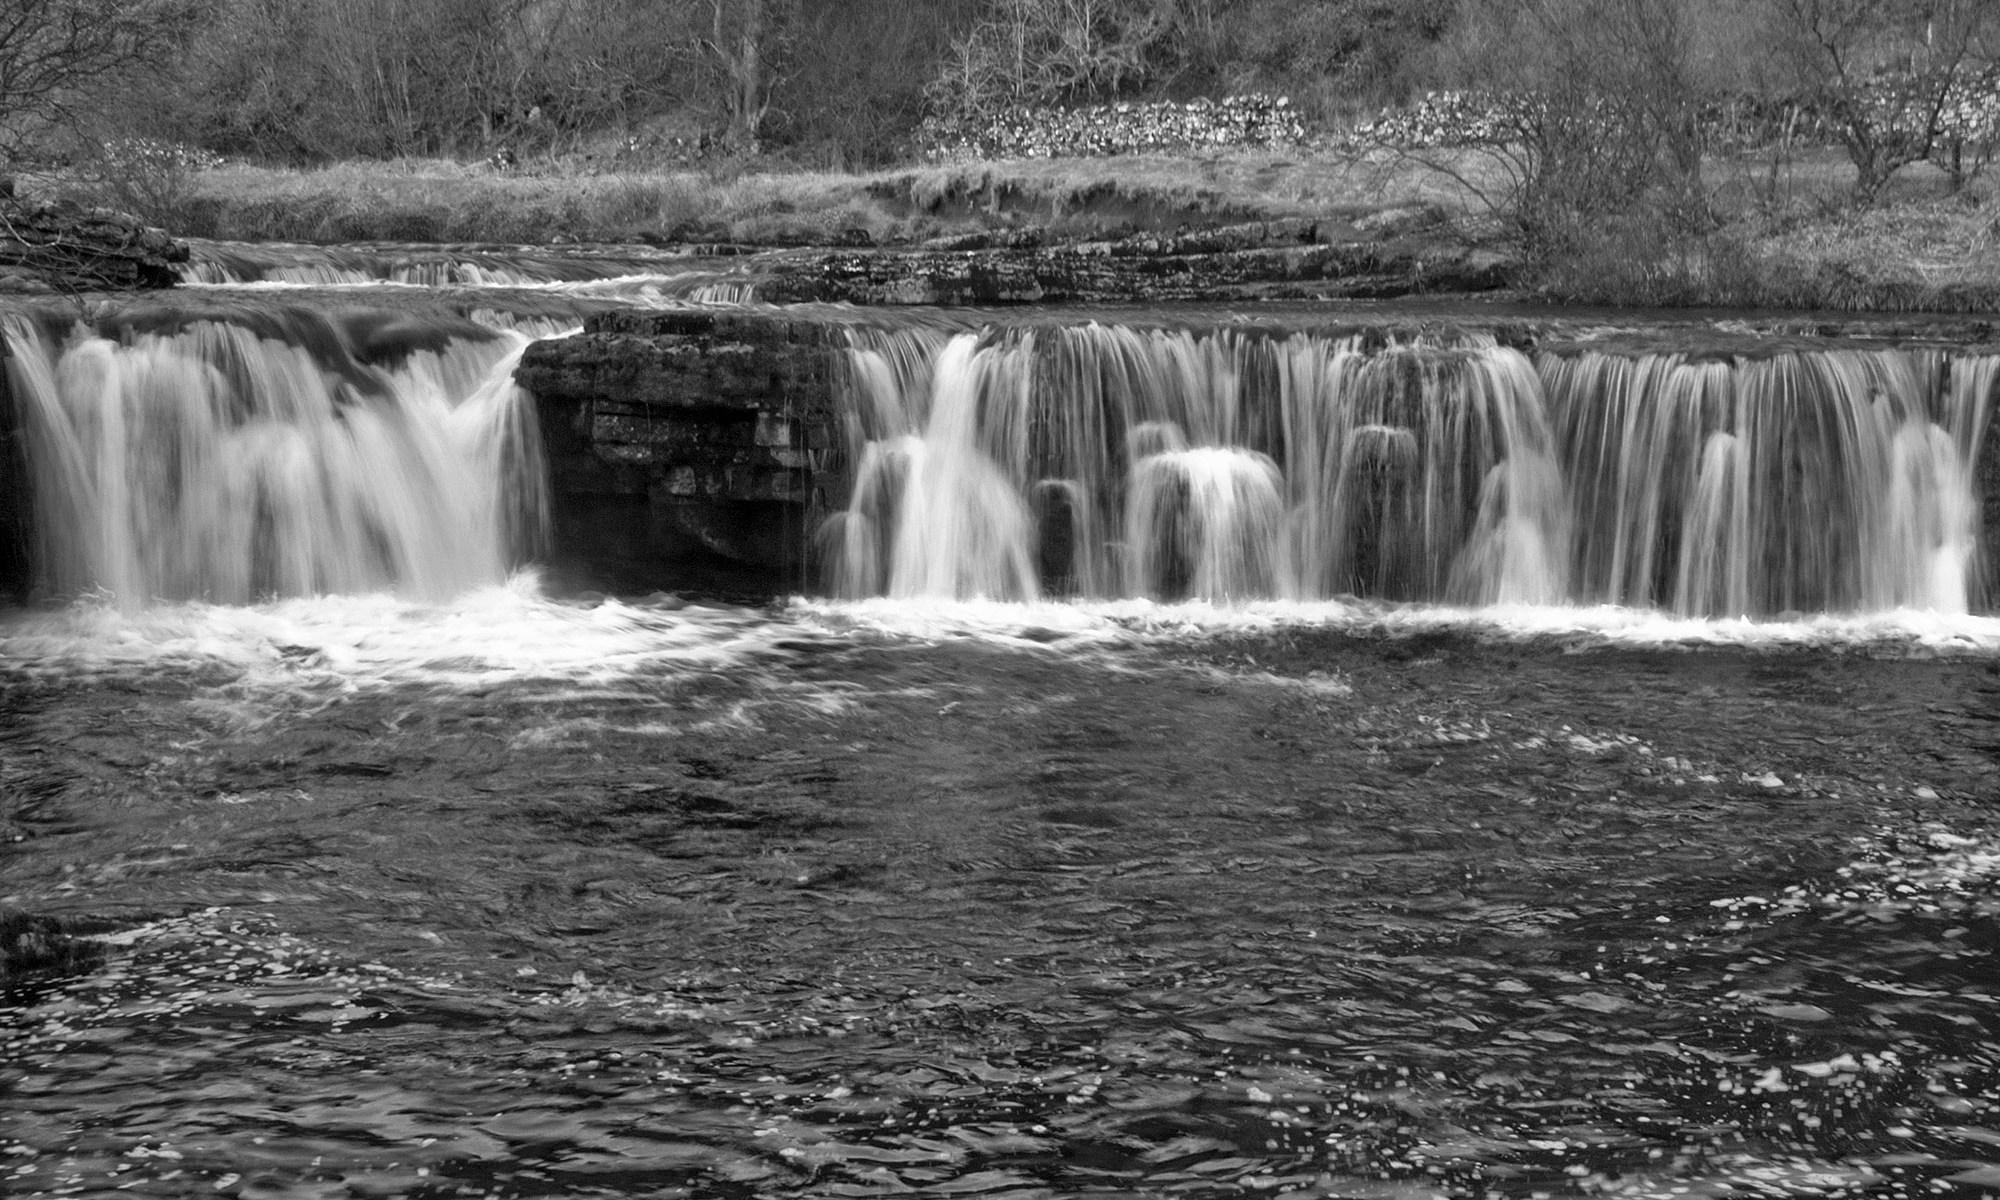 Wainwath Falls, Swaledale, Yorkshire Dales